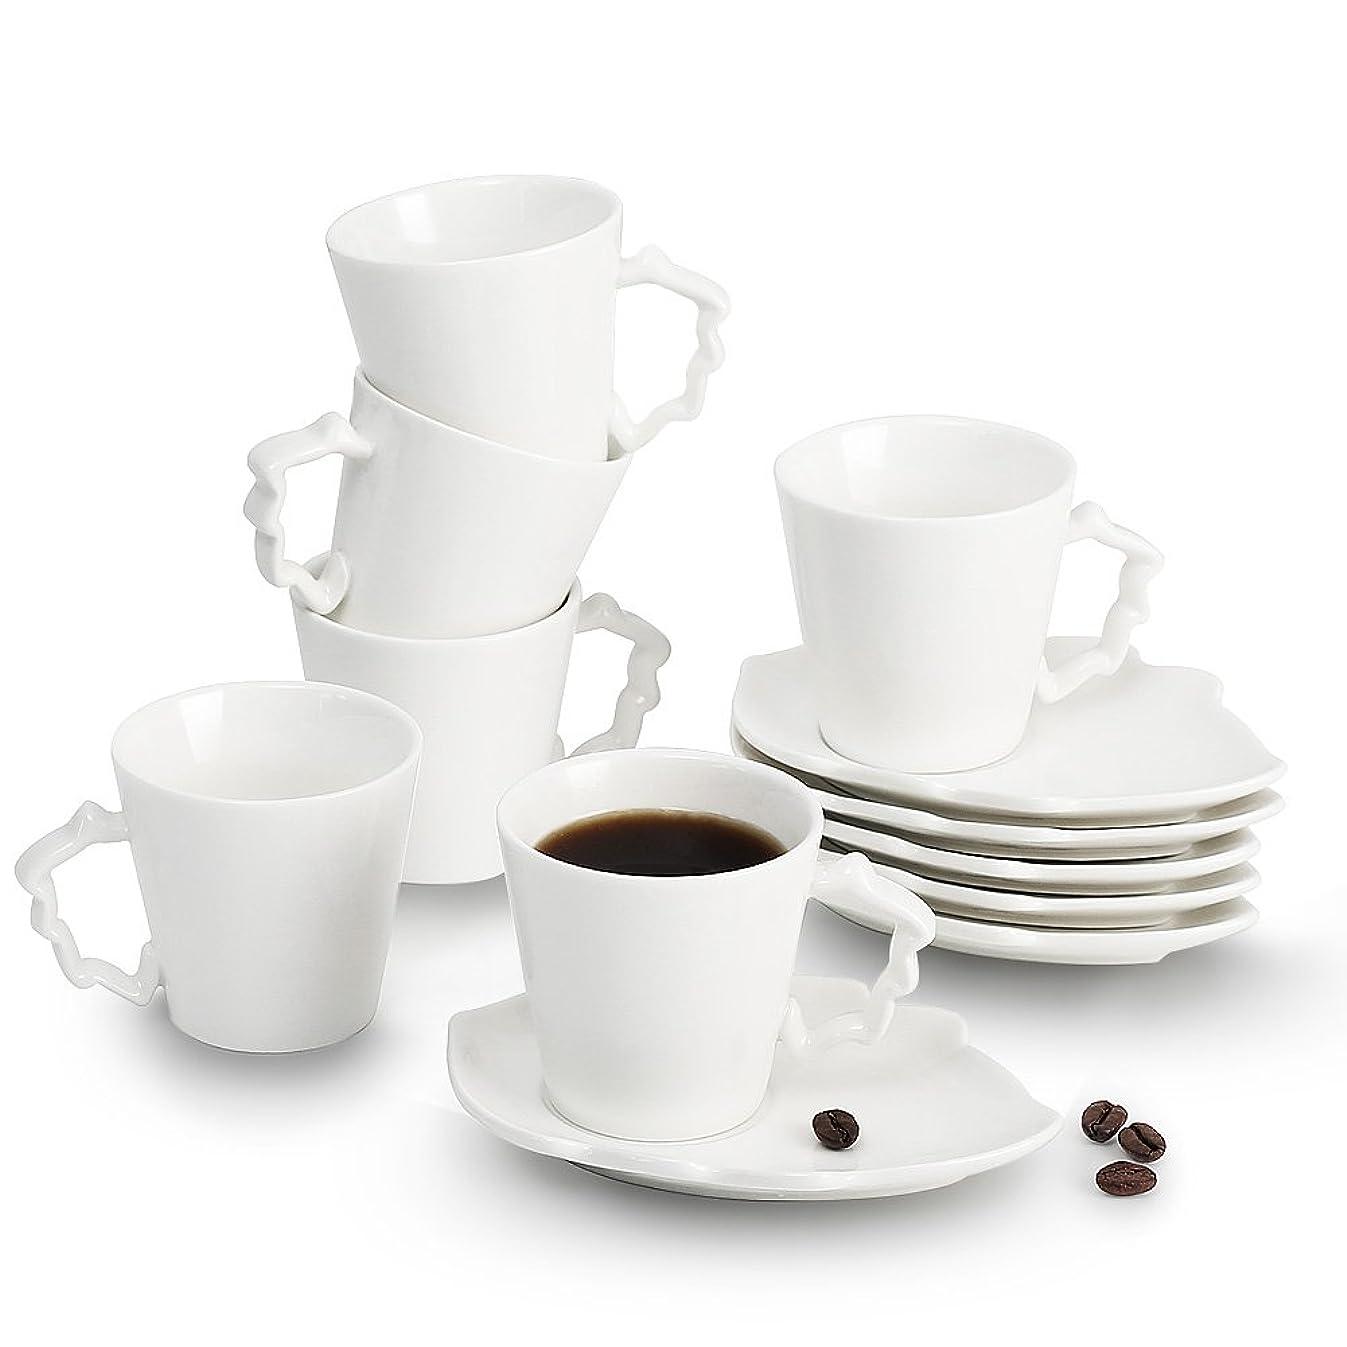 Porcelain Ceramics Italian Turkish Mini Espresso Coffee Cups Leaves Series 2 oz Cups & Saucers Set of 6,Sweejar Home